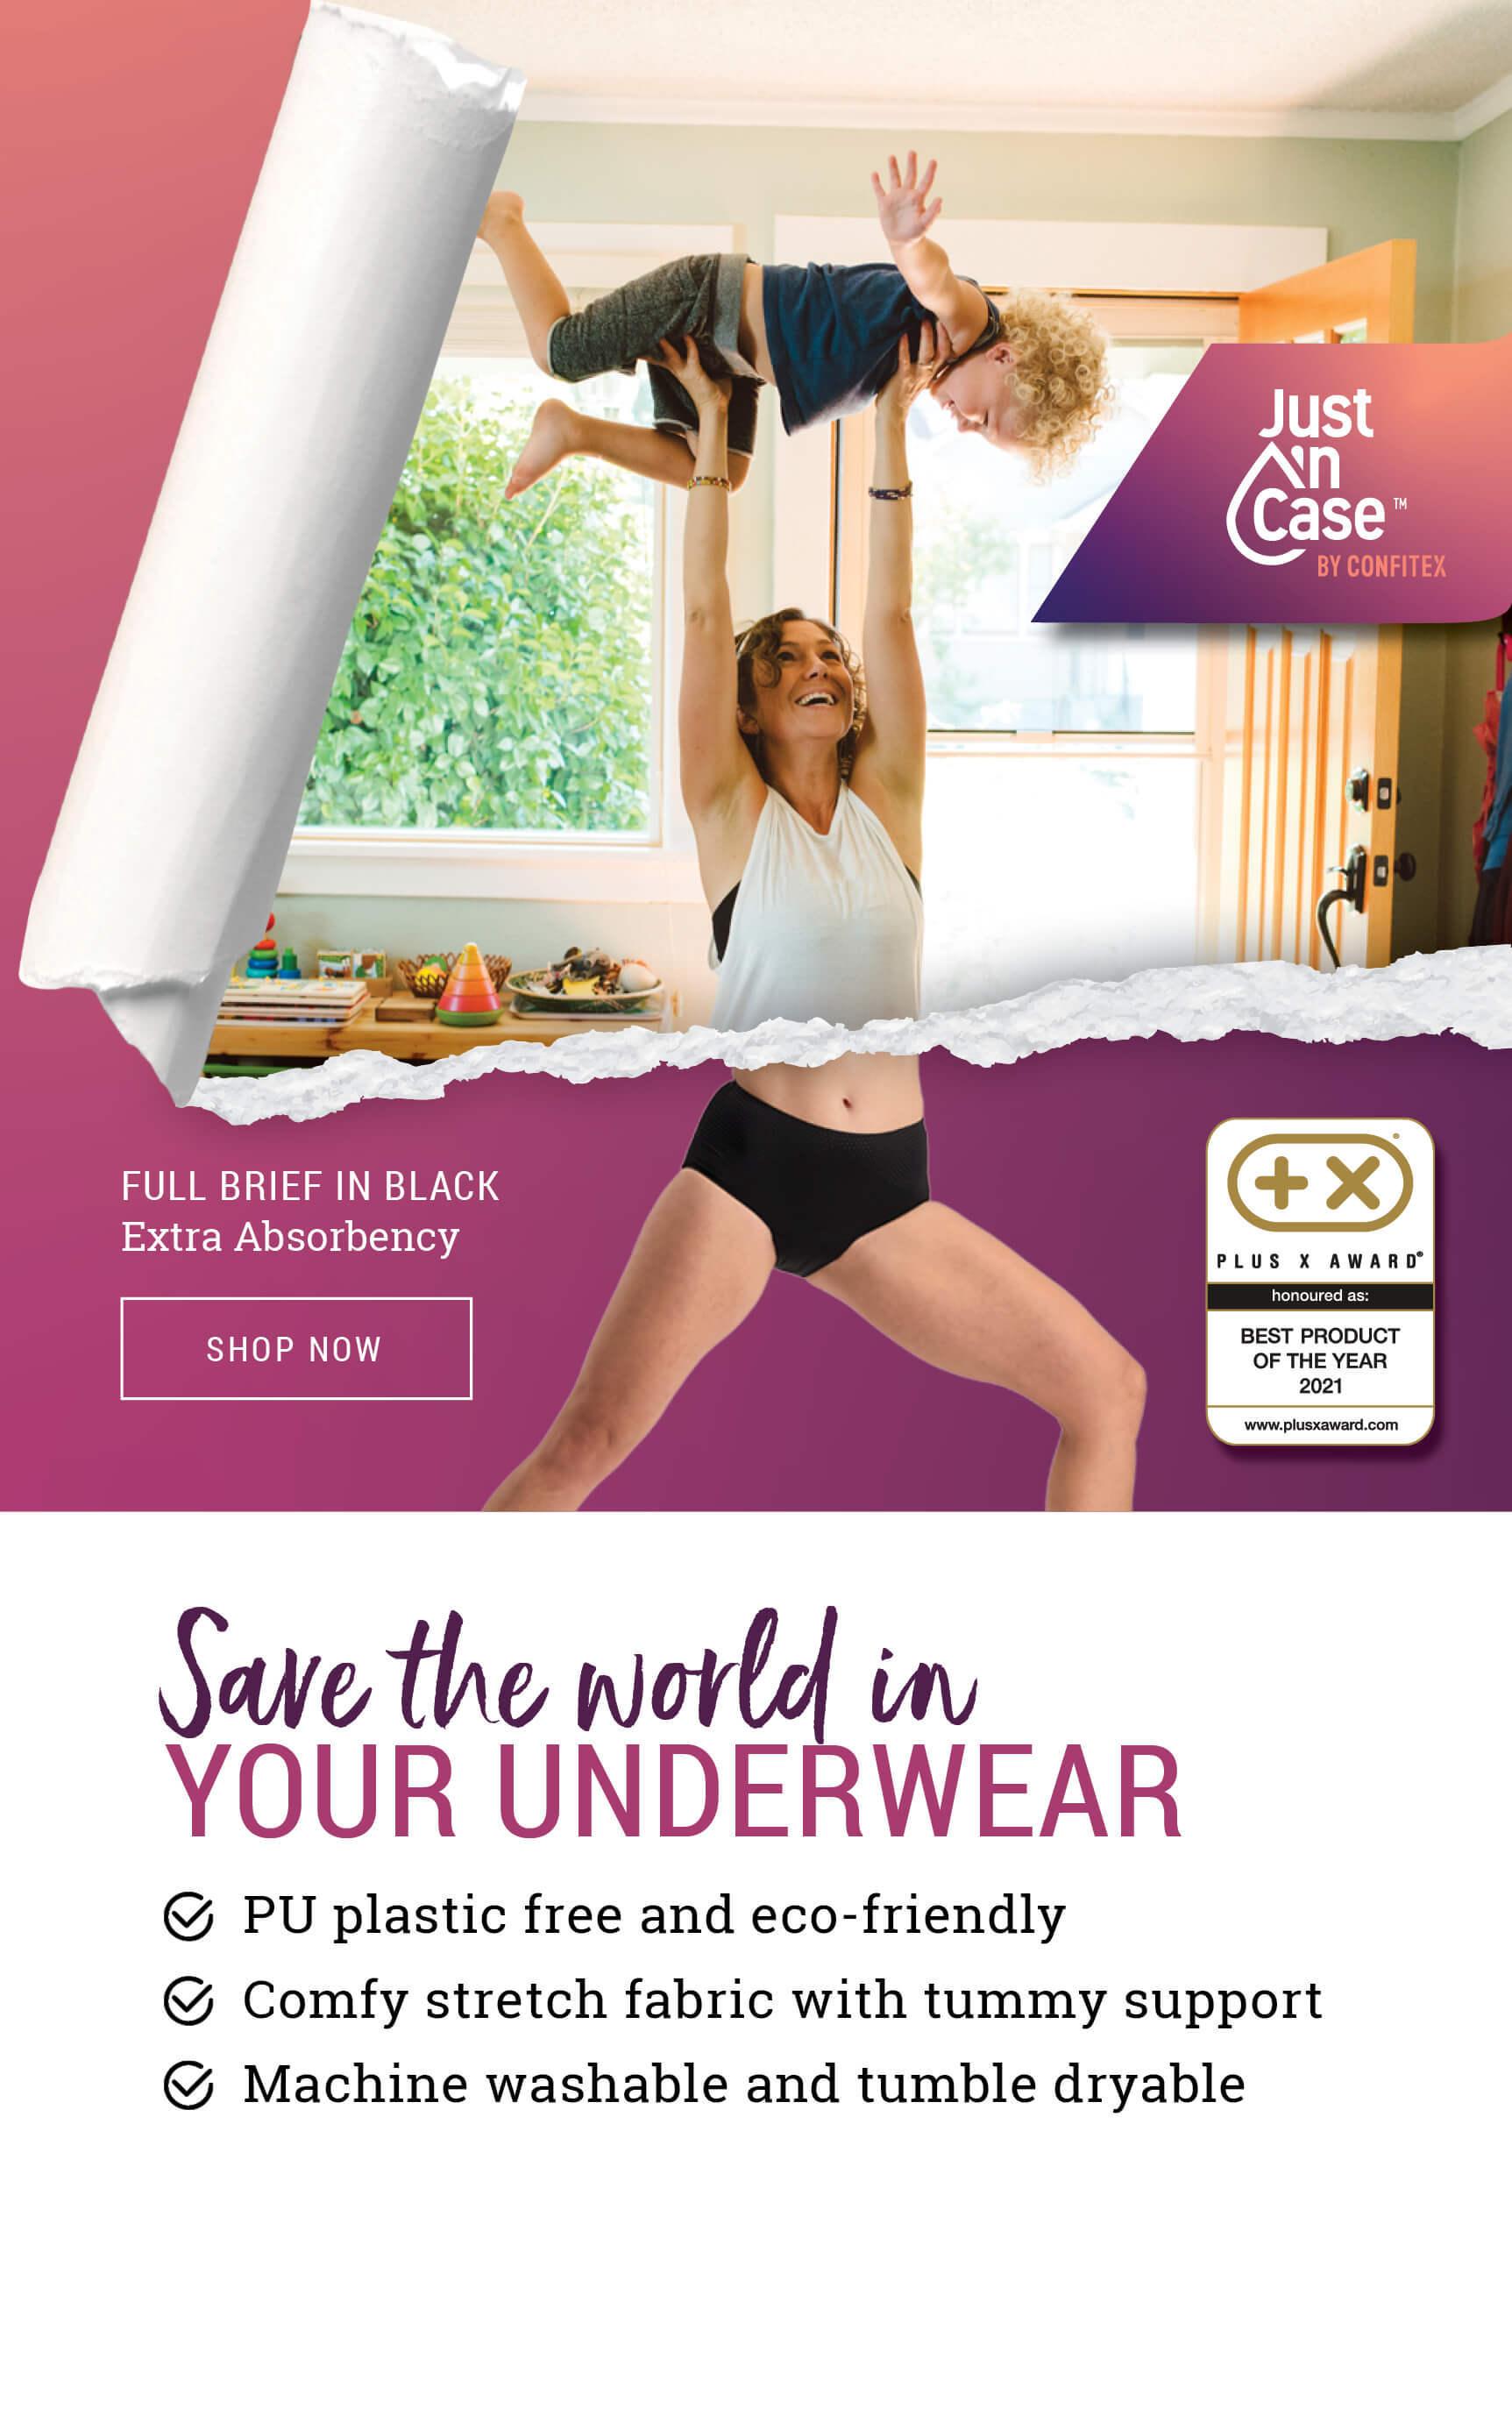 Most absorbent washable period underwear